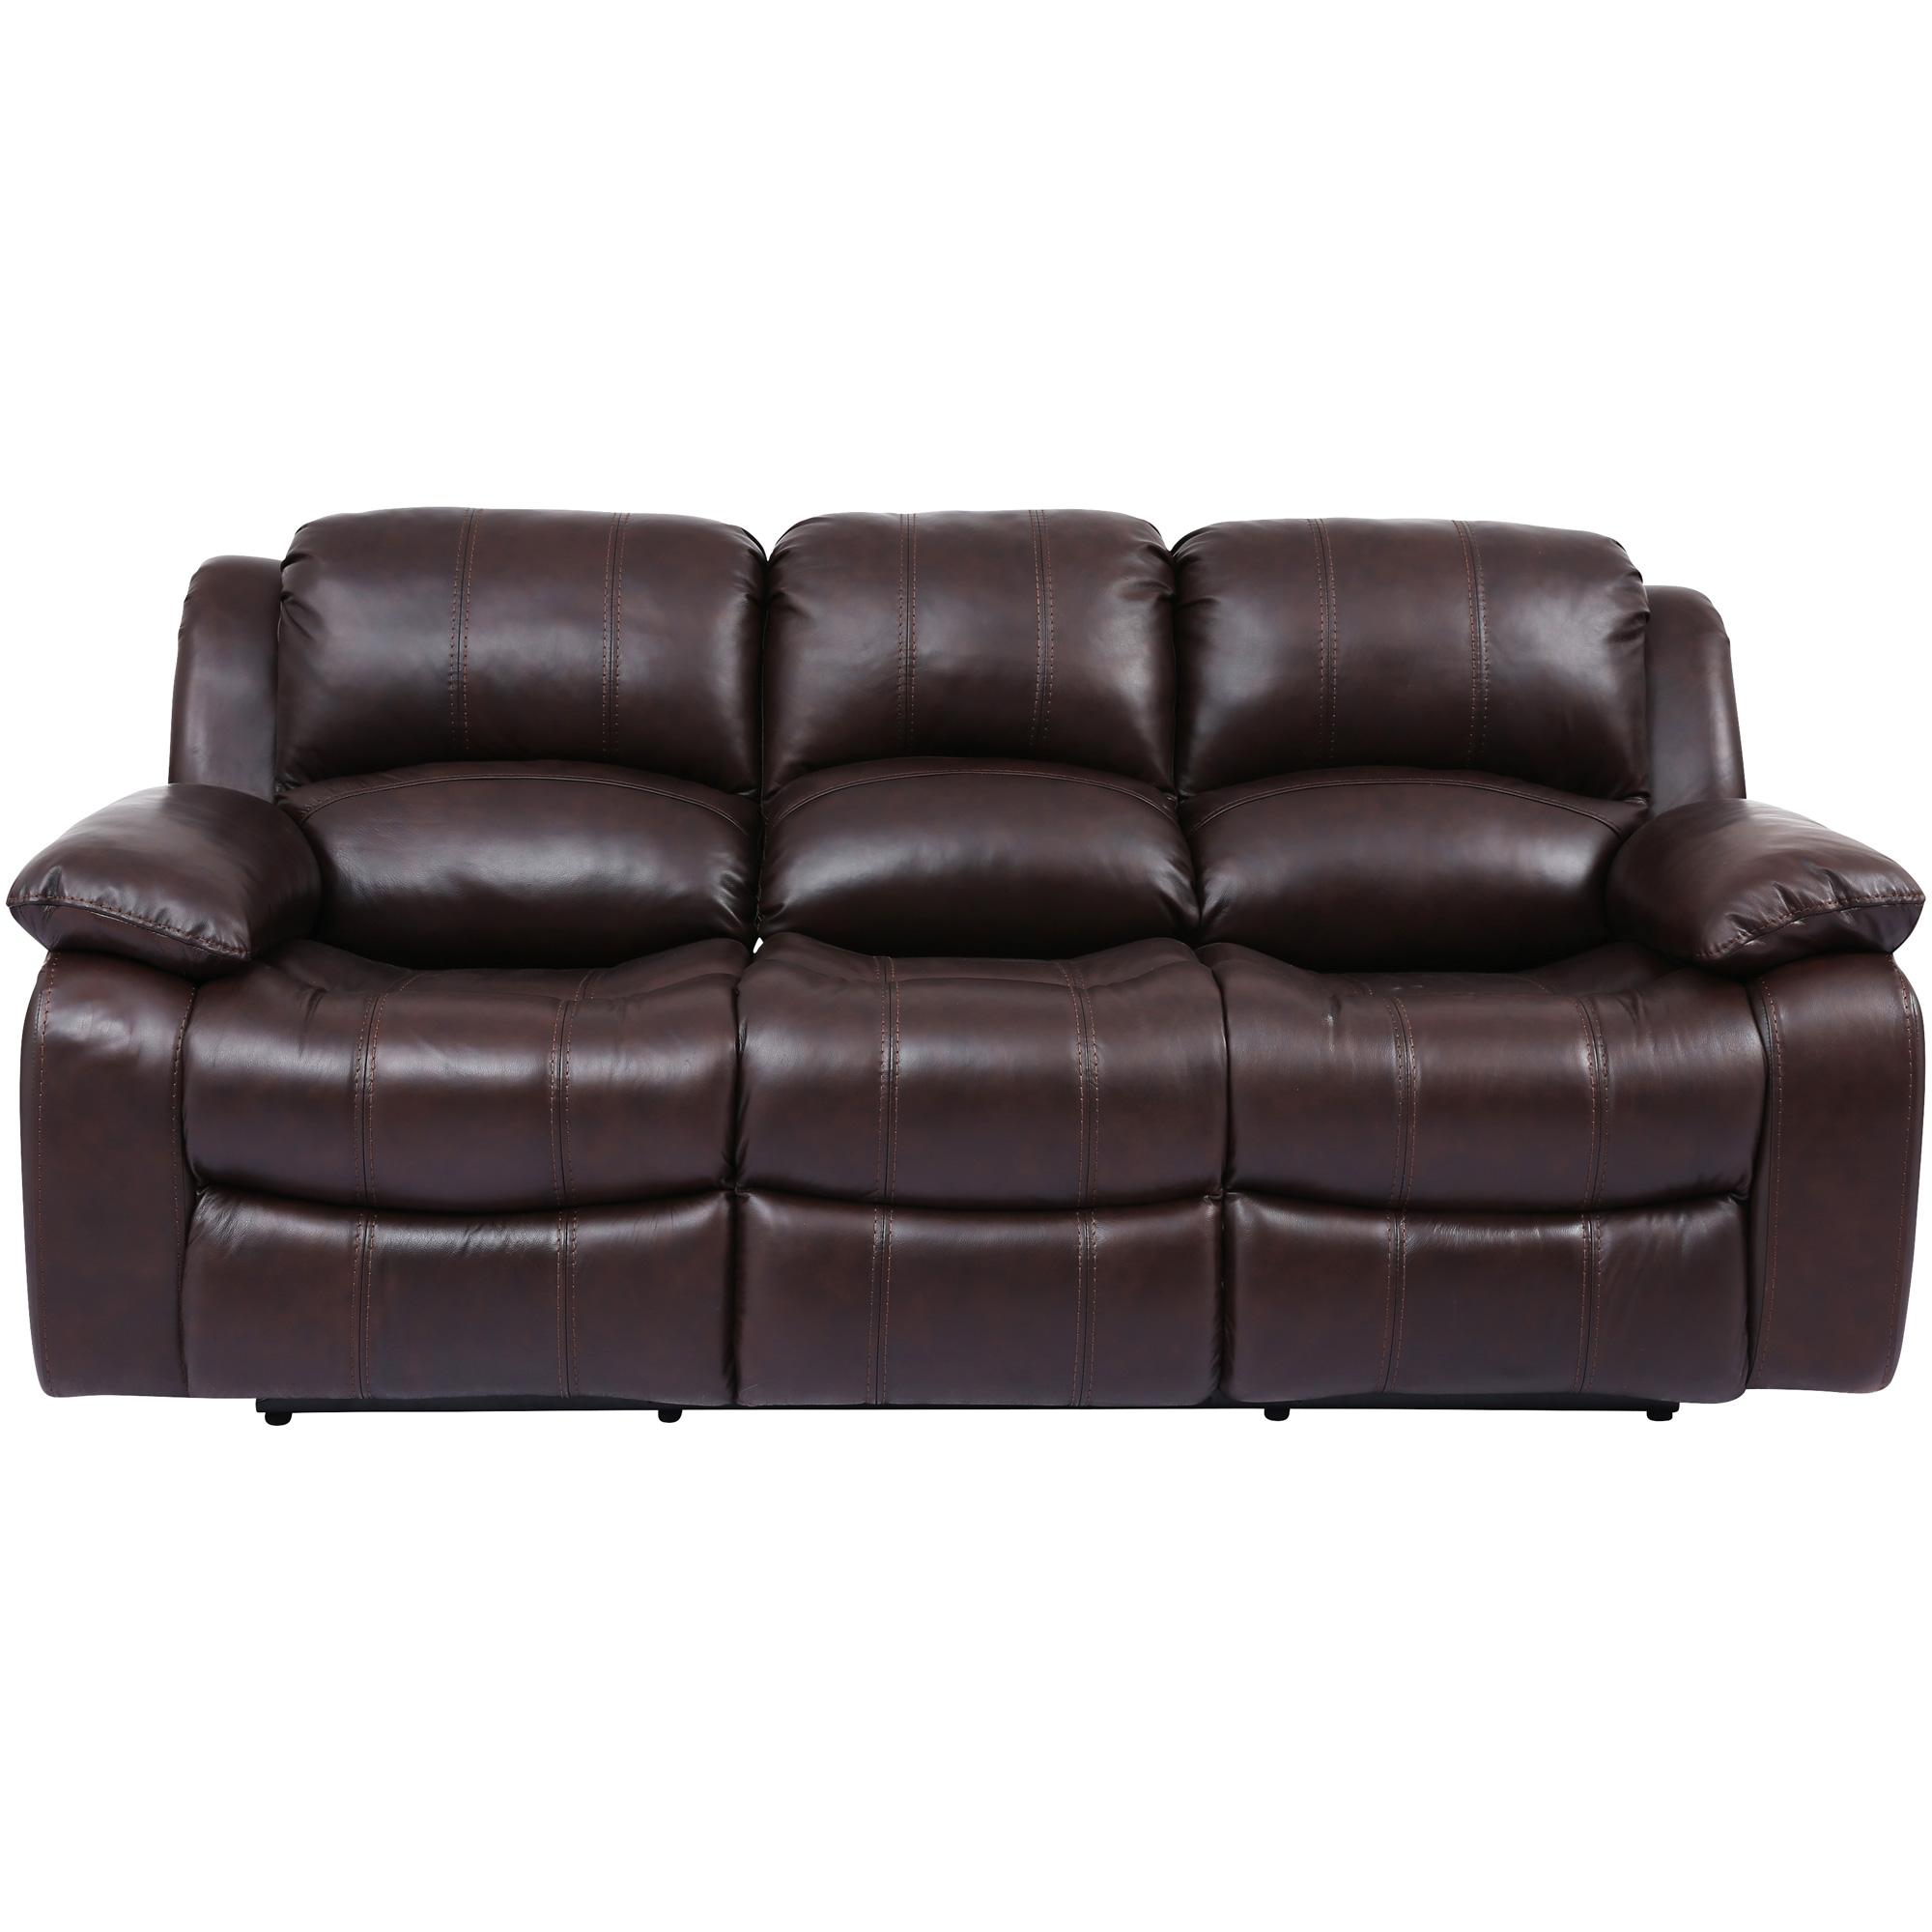 Wah Cheers | Ender Brown Leather Reclining Sofa